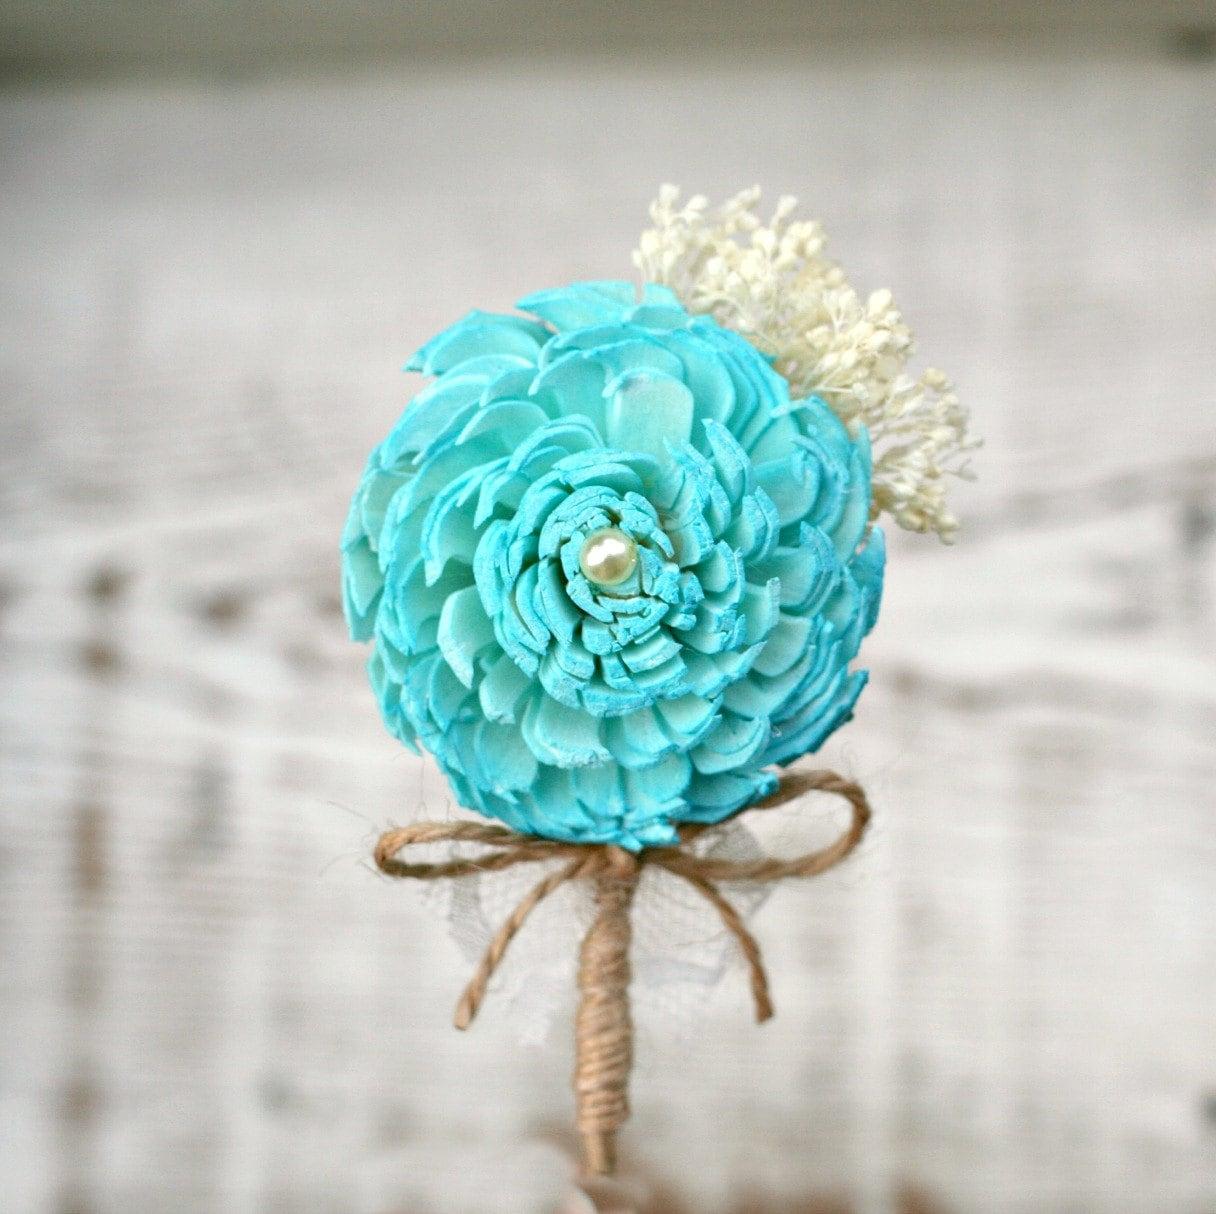 Turquoise Flowers For Wedding: Turquoise Flower Wedding Boutonniere // Aqua Sola Wood